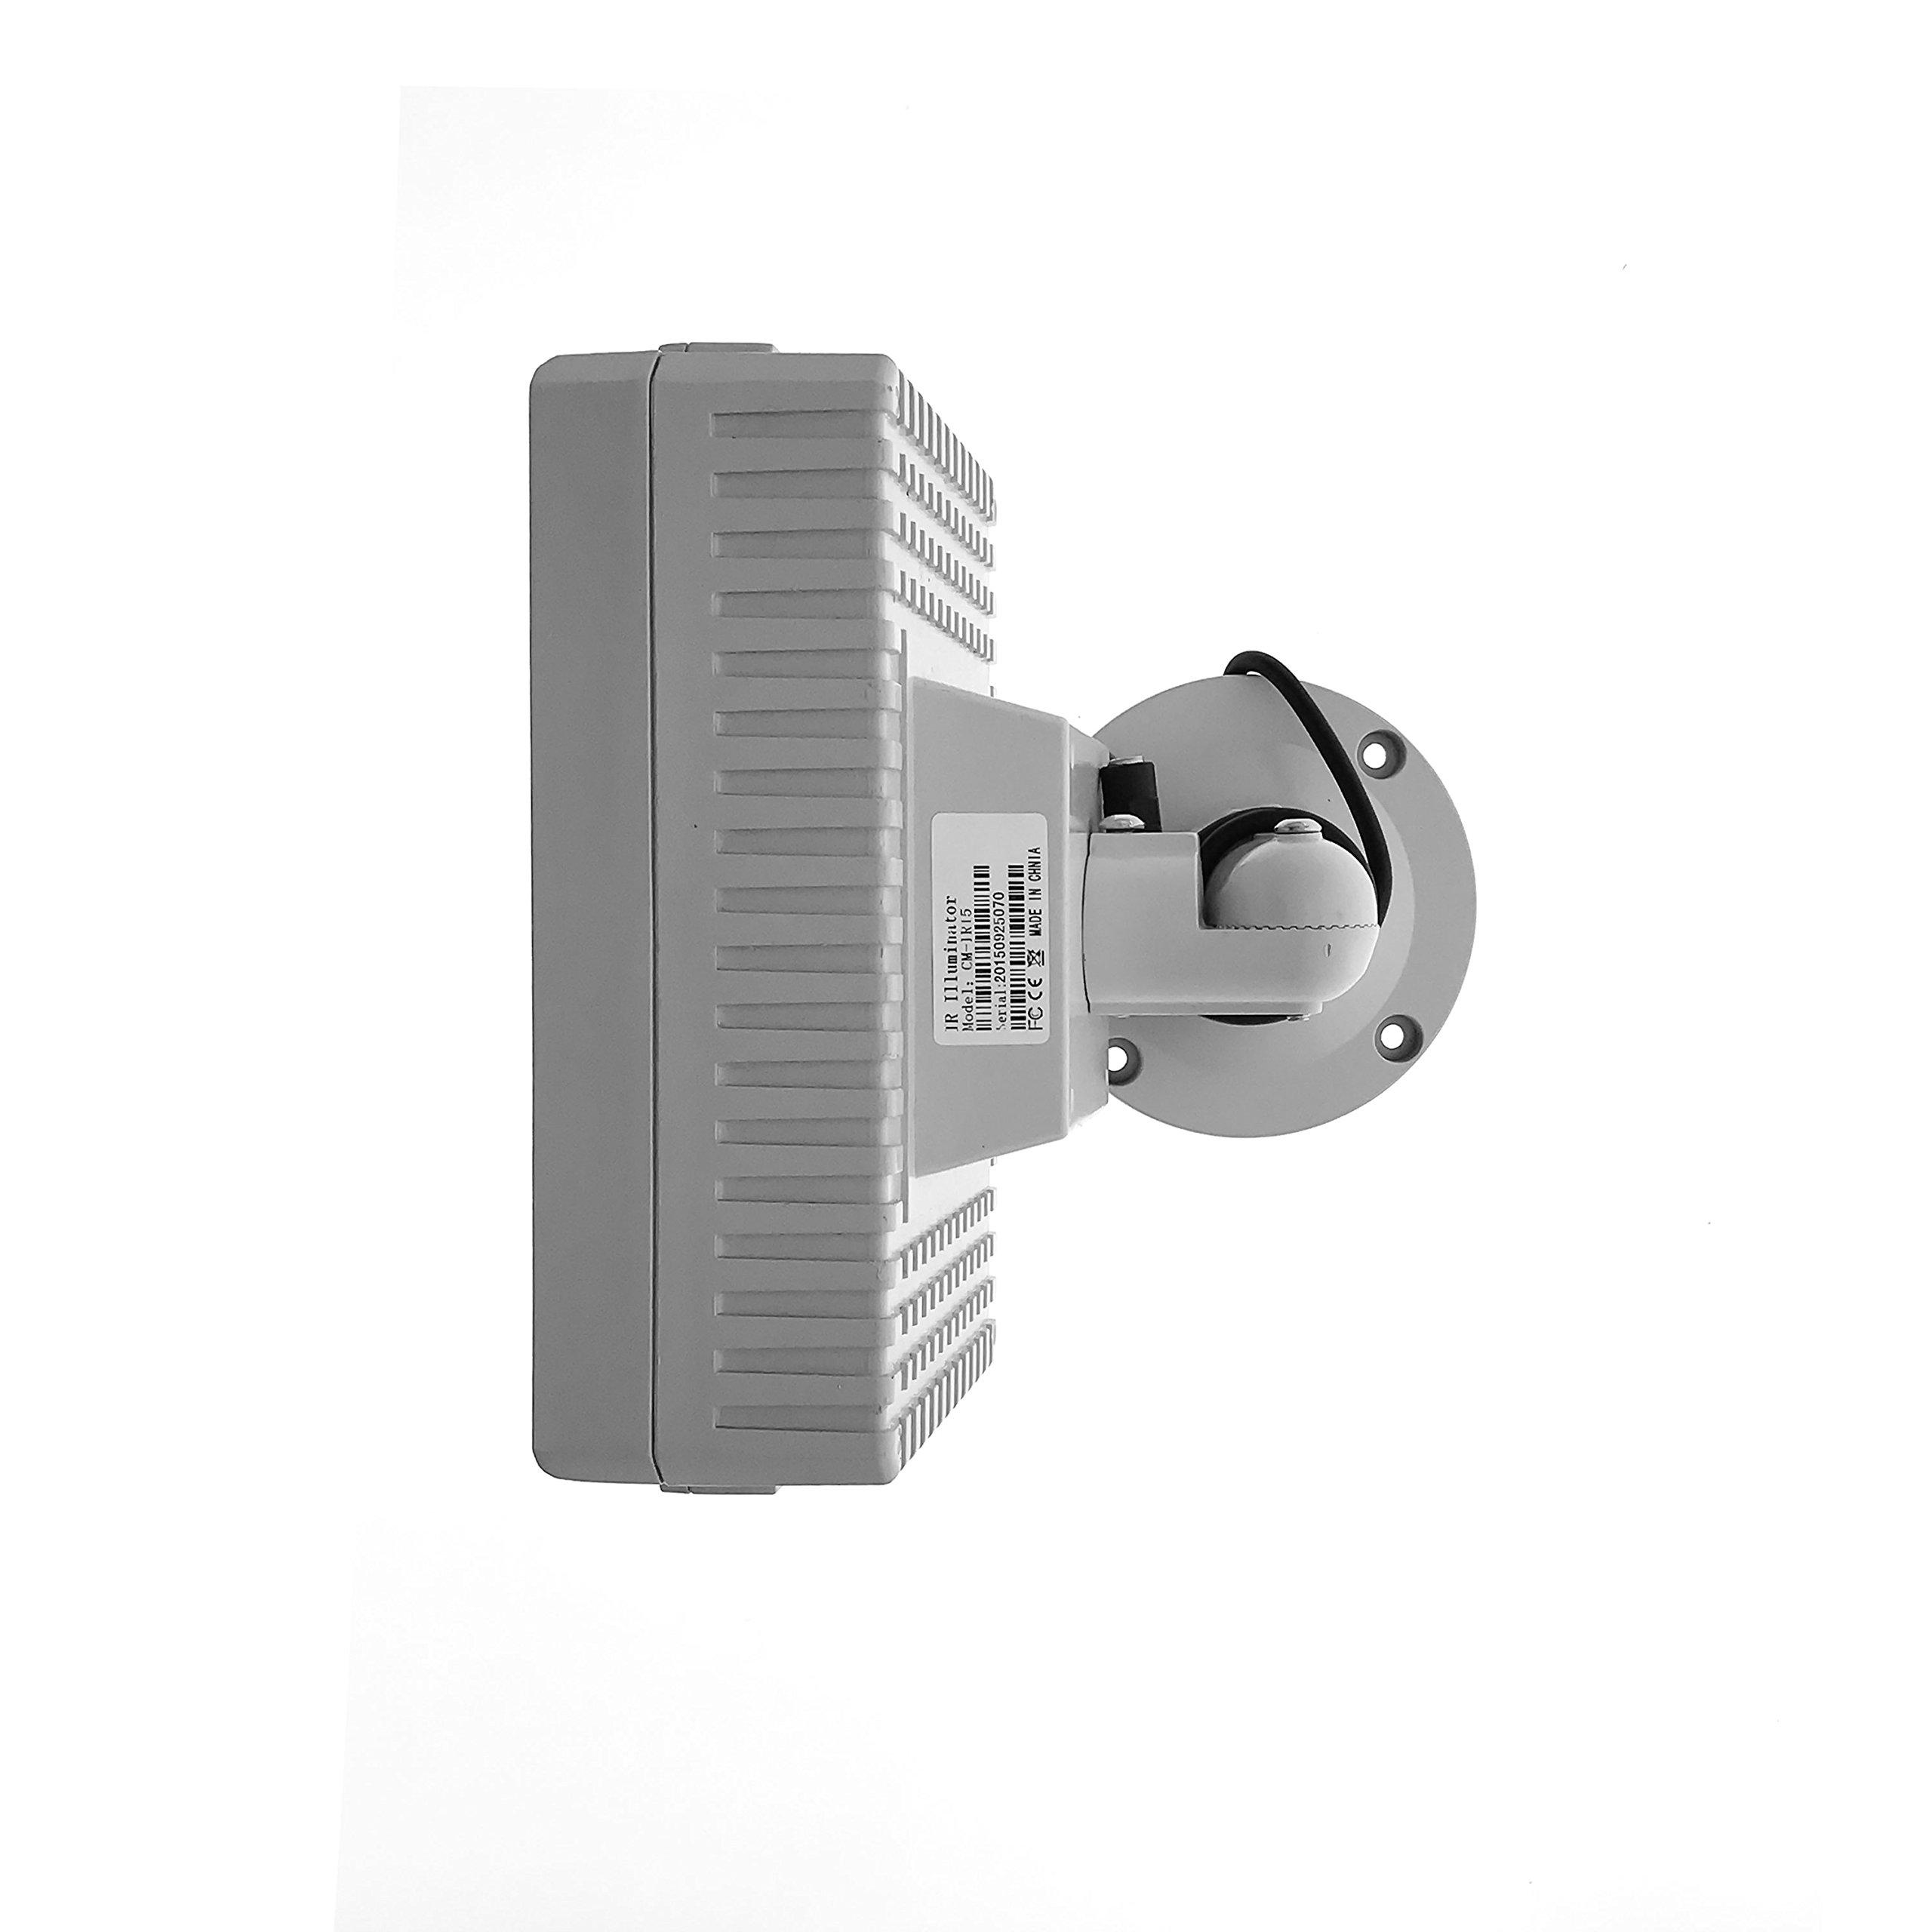 CMVision CMVE-IR15 Wide Angle 60-80° Power LED IR Array Illuminator 200-300' Long Range with Free 12VDC 3A Power Adaptor, 15 Piece by CMVision (Image #2)